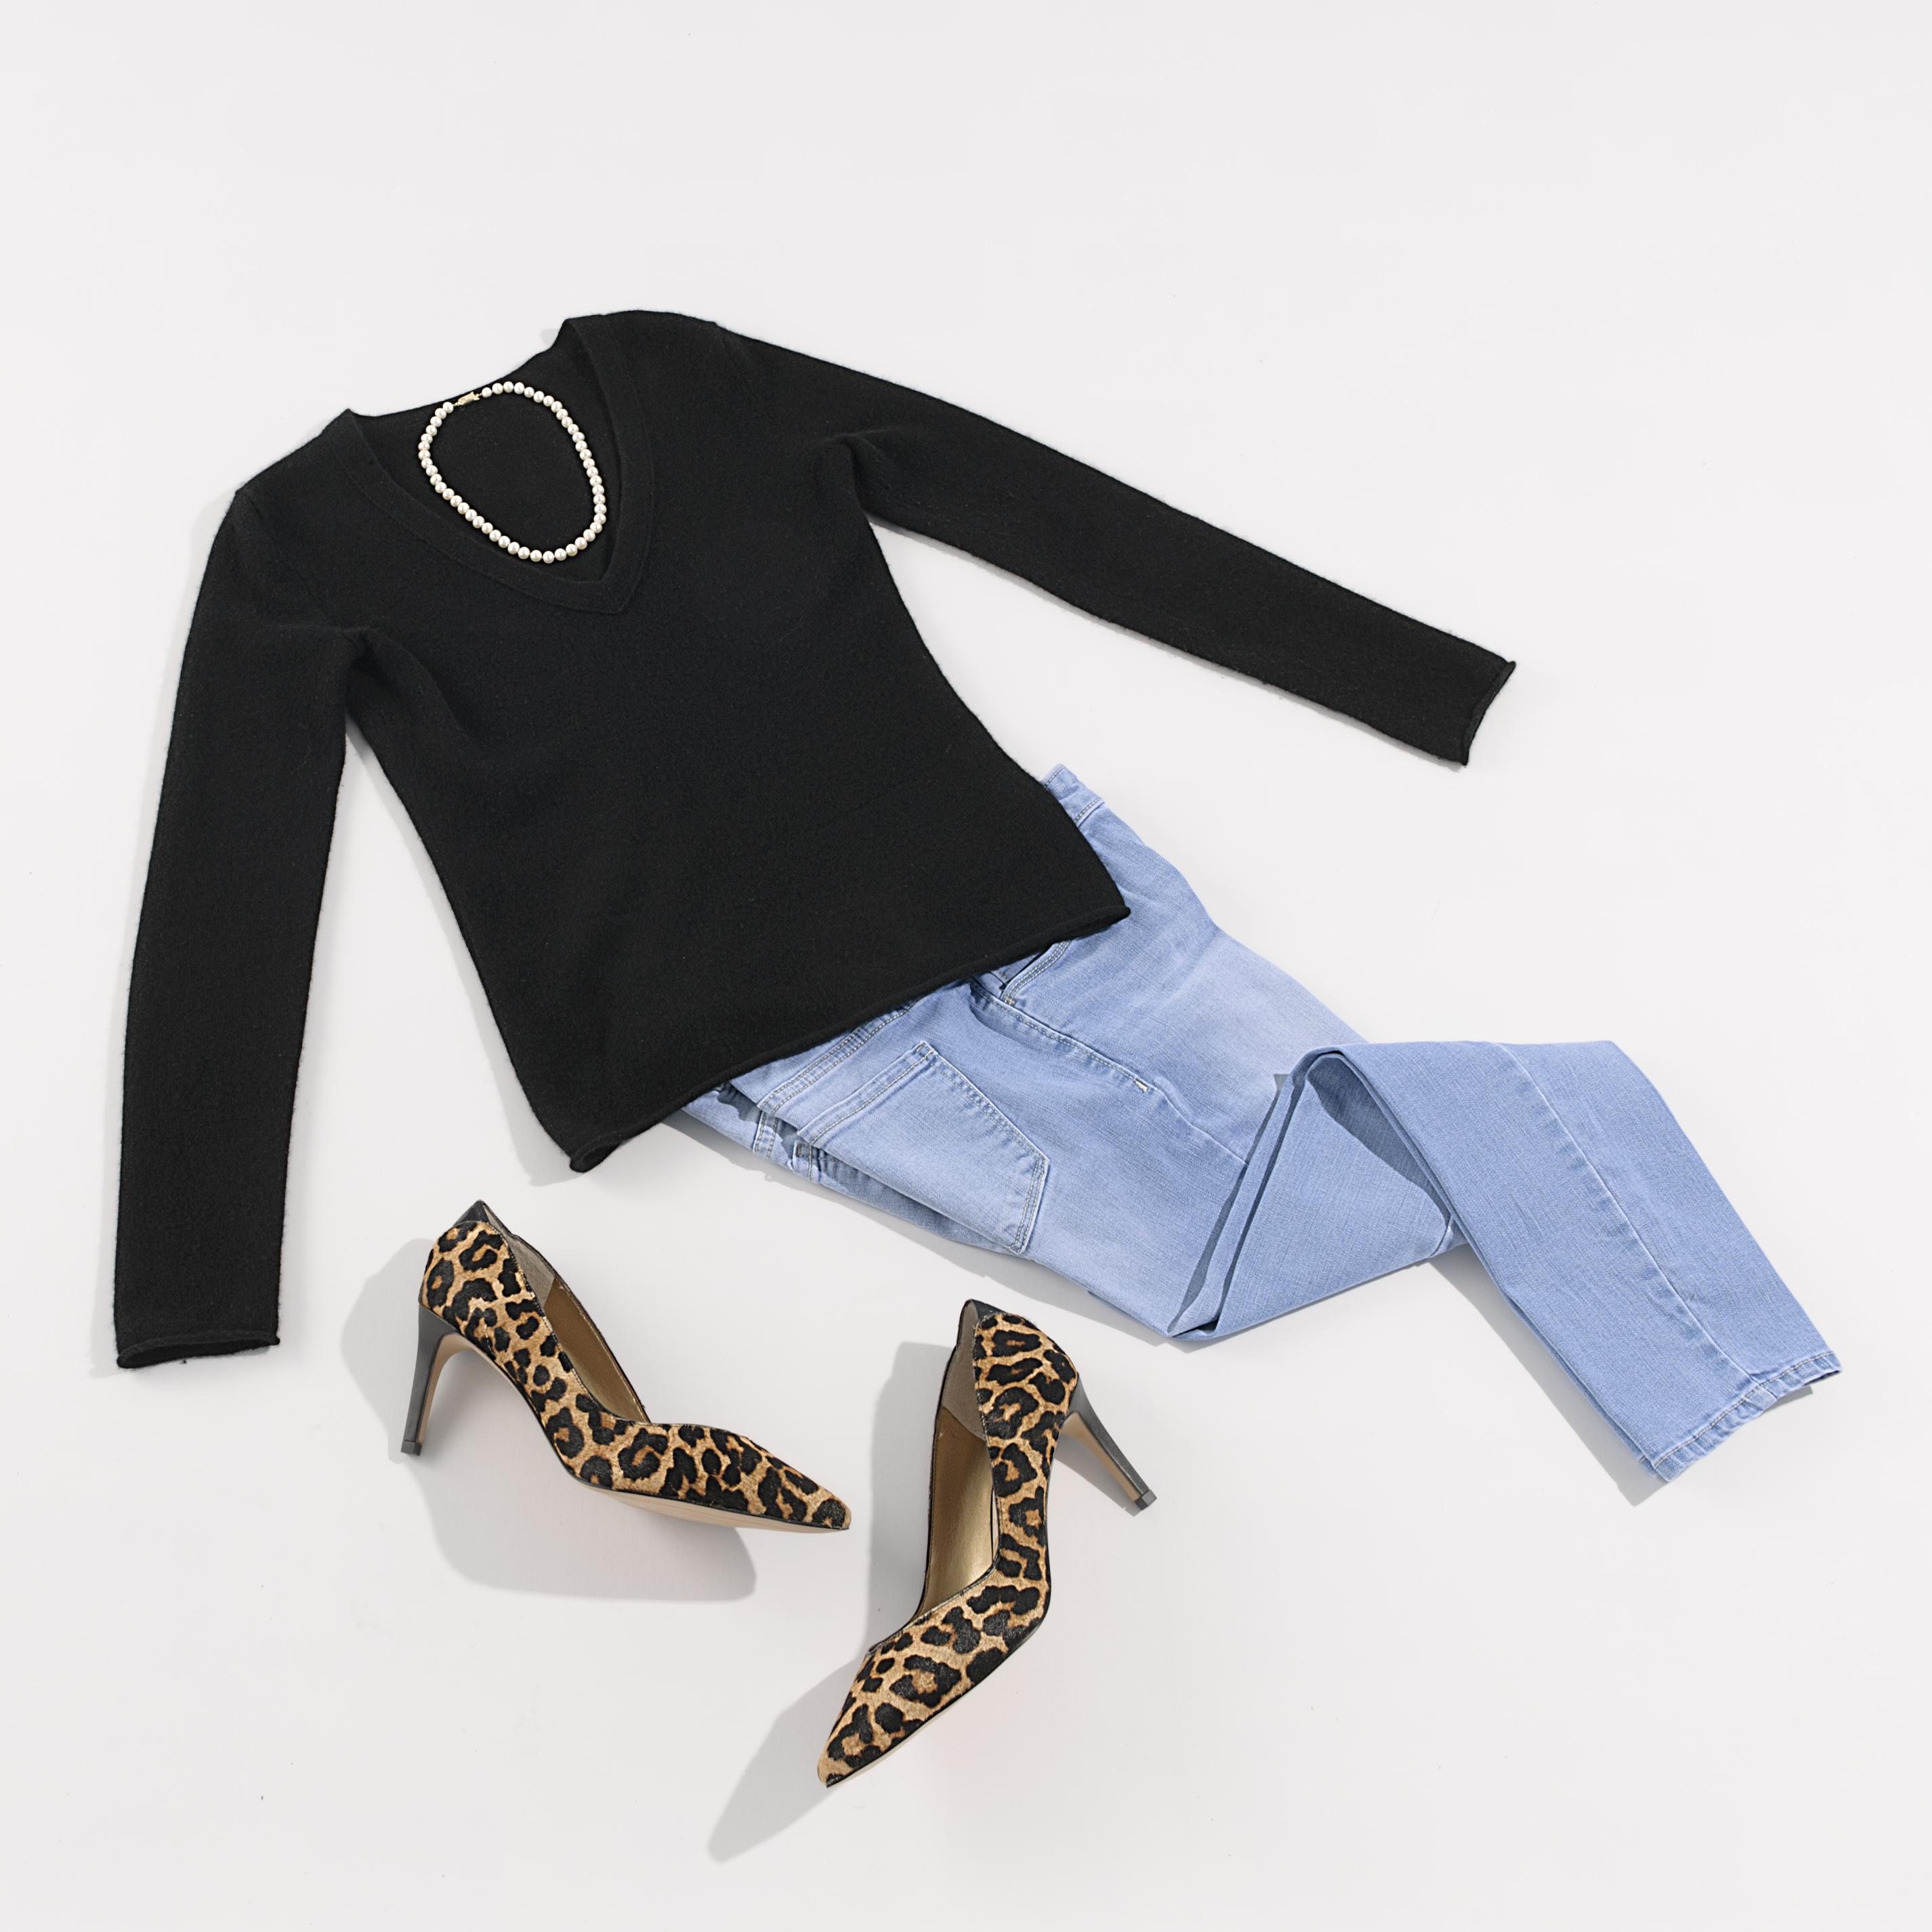 style & clothing step 10